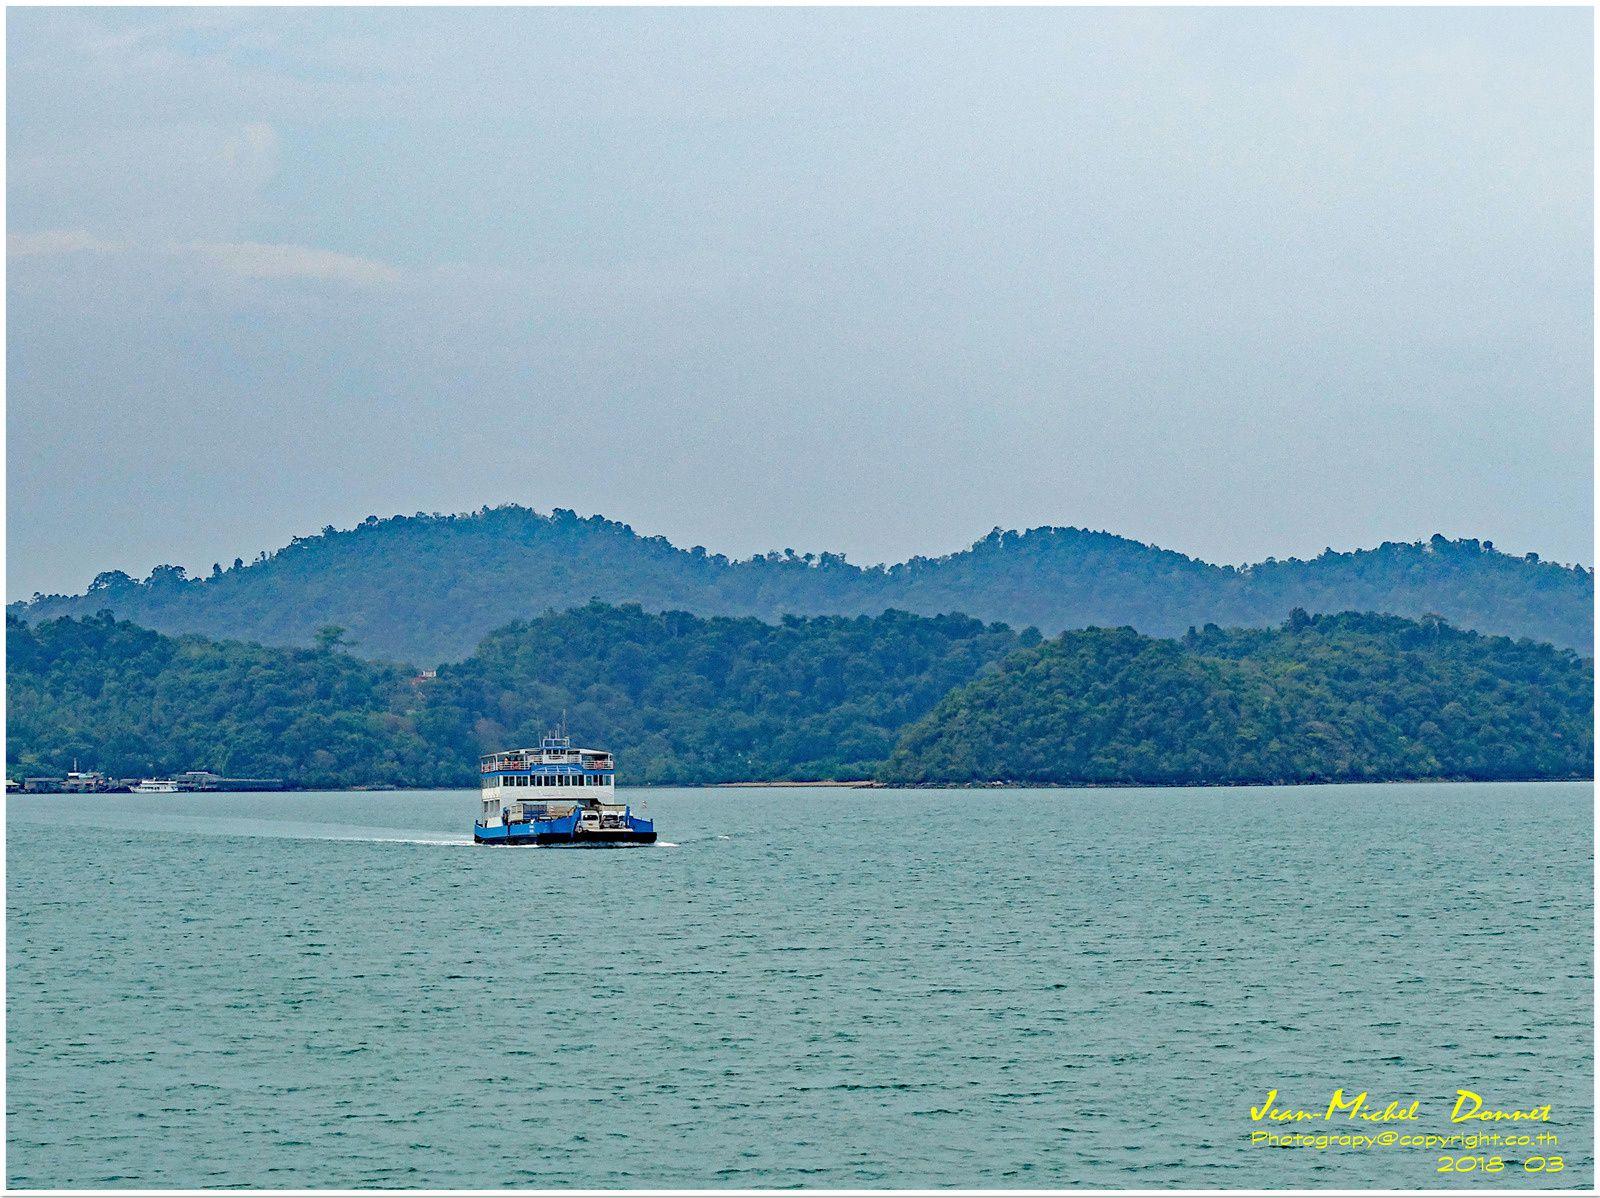 L'arrivée sur Ko Chang, destination Coral resort.